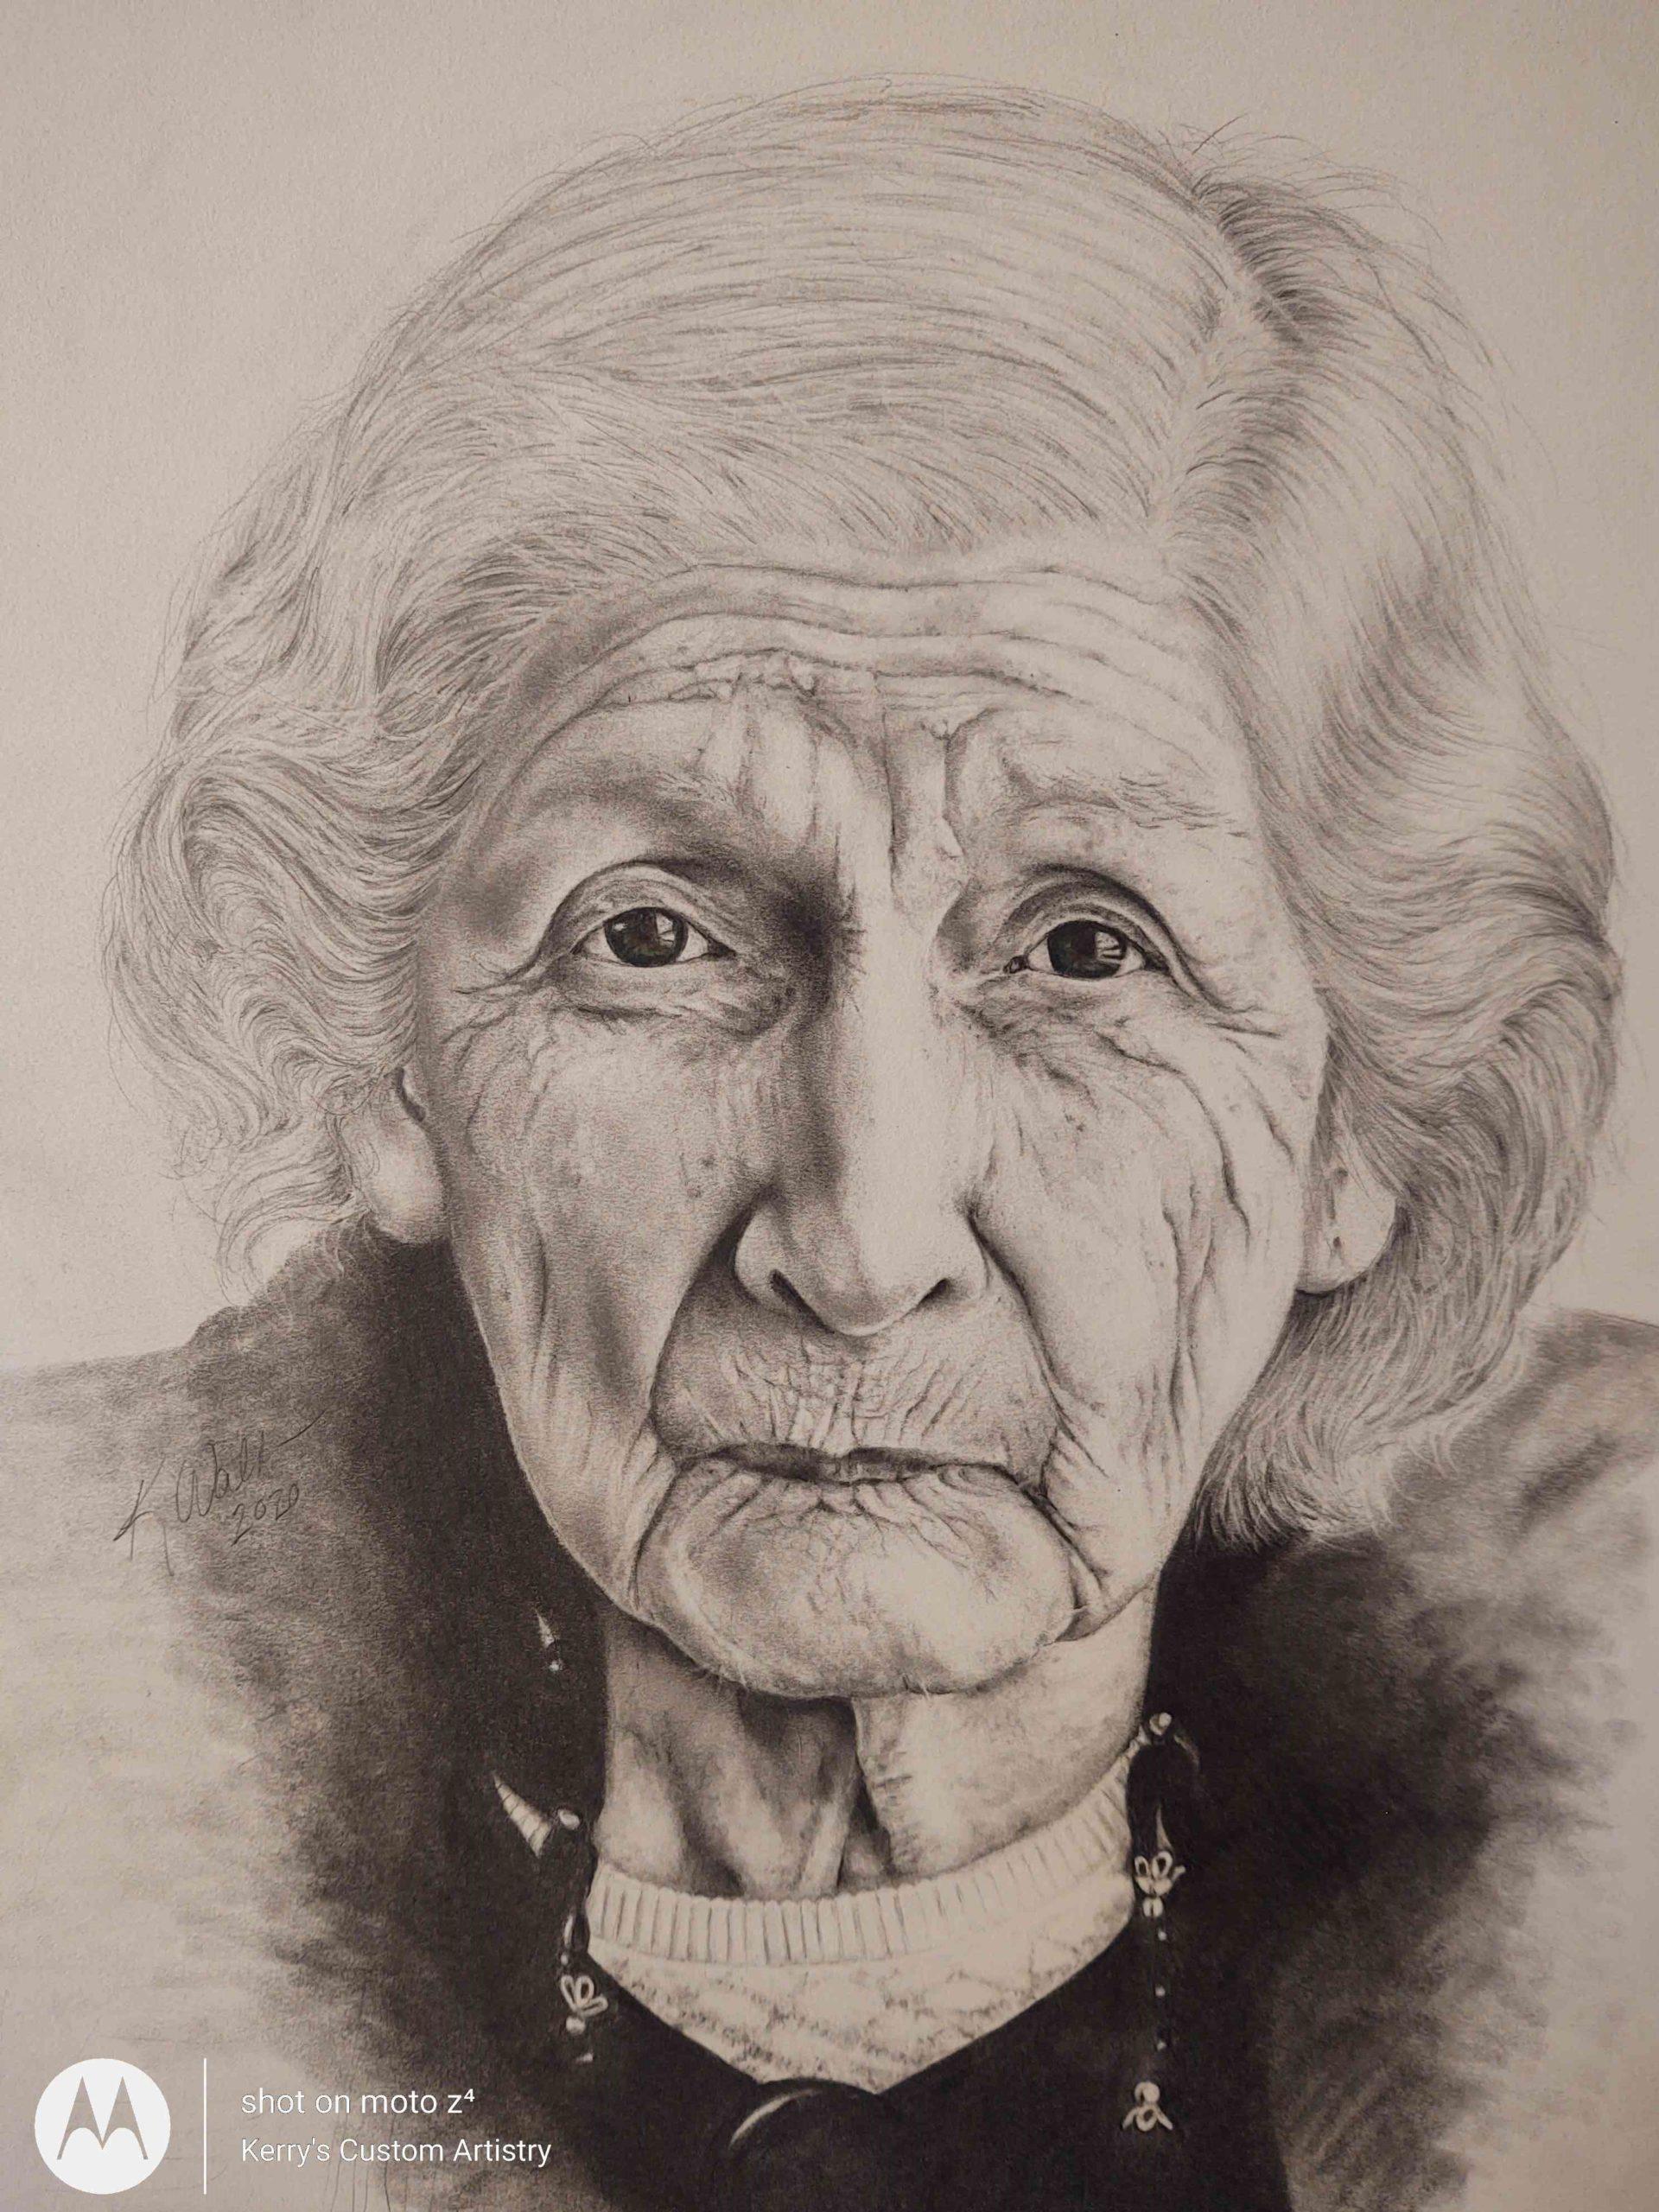 SHE DESERVED A BETTER GOODBYE by KERRY WALKER